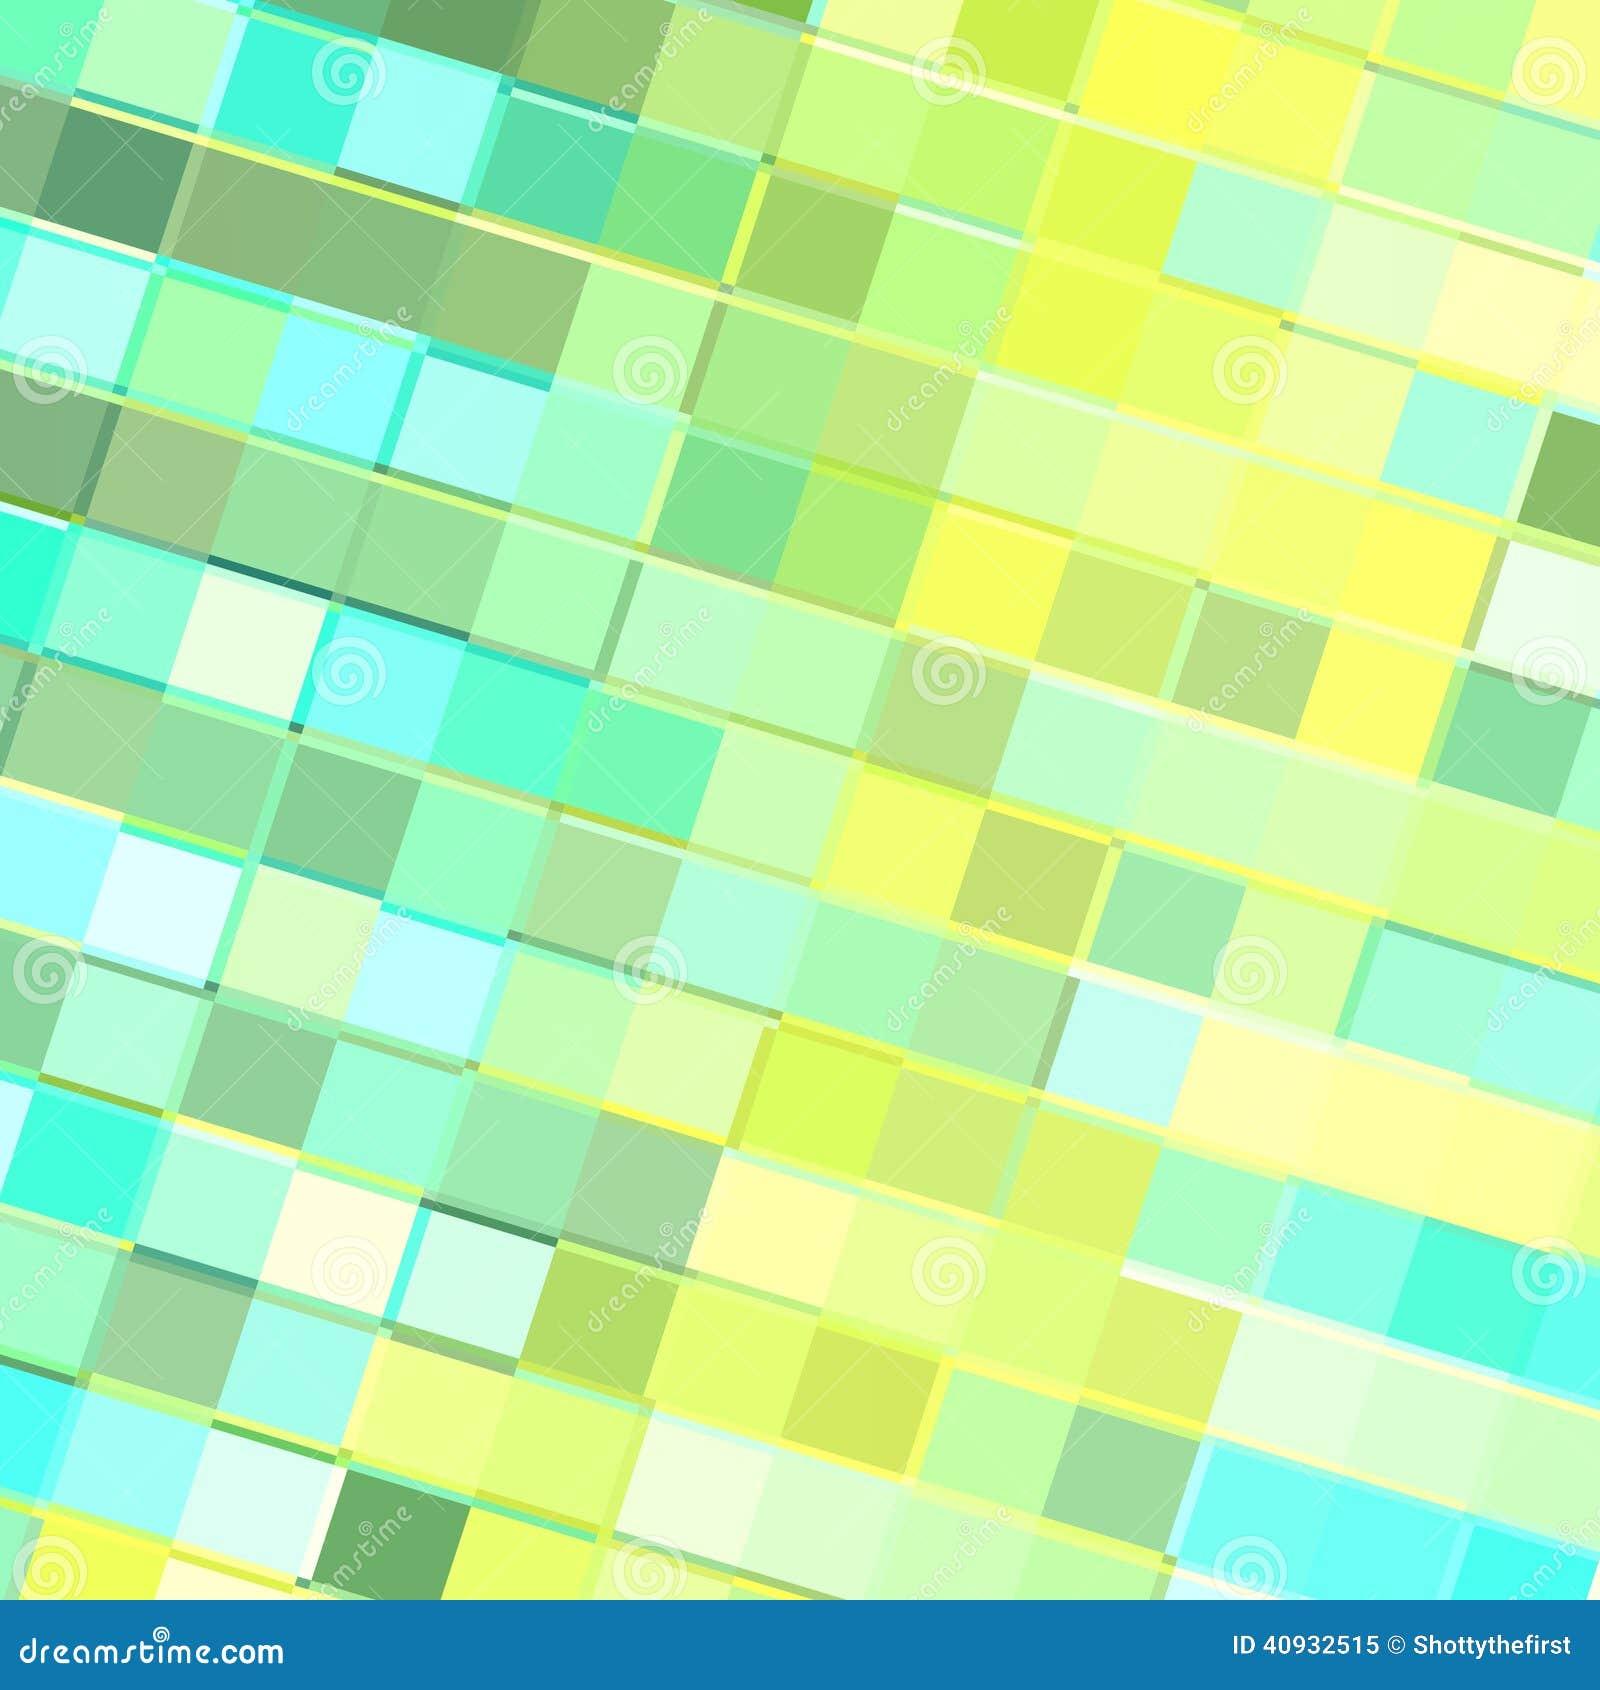 Turquoise Yellow Tiles stock illustration. Illustration of book ...